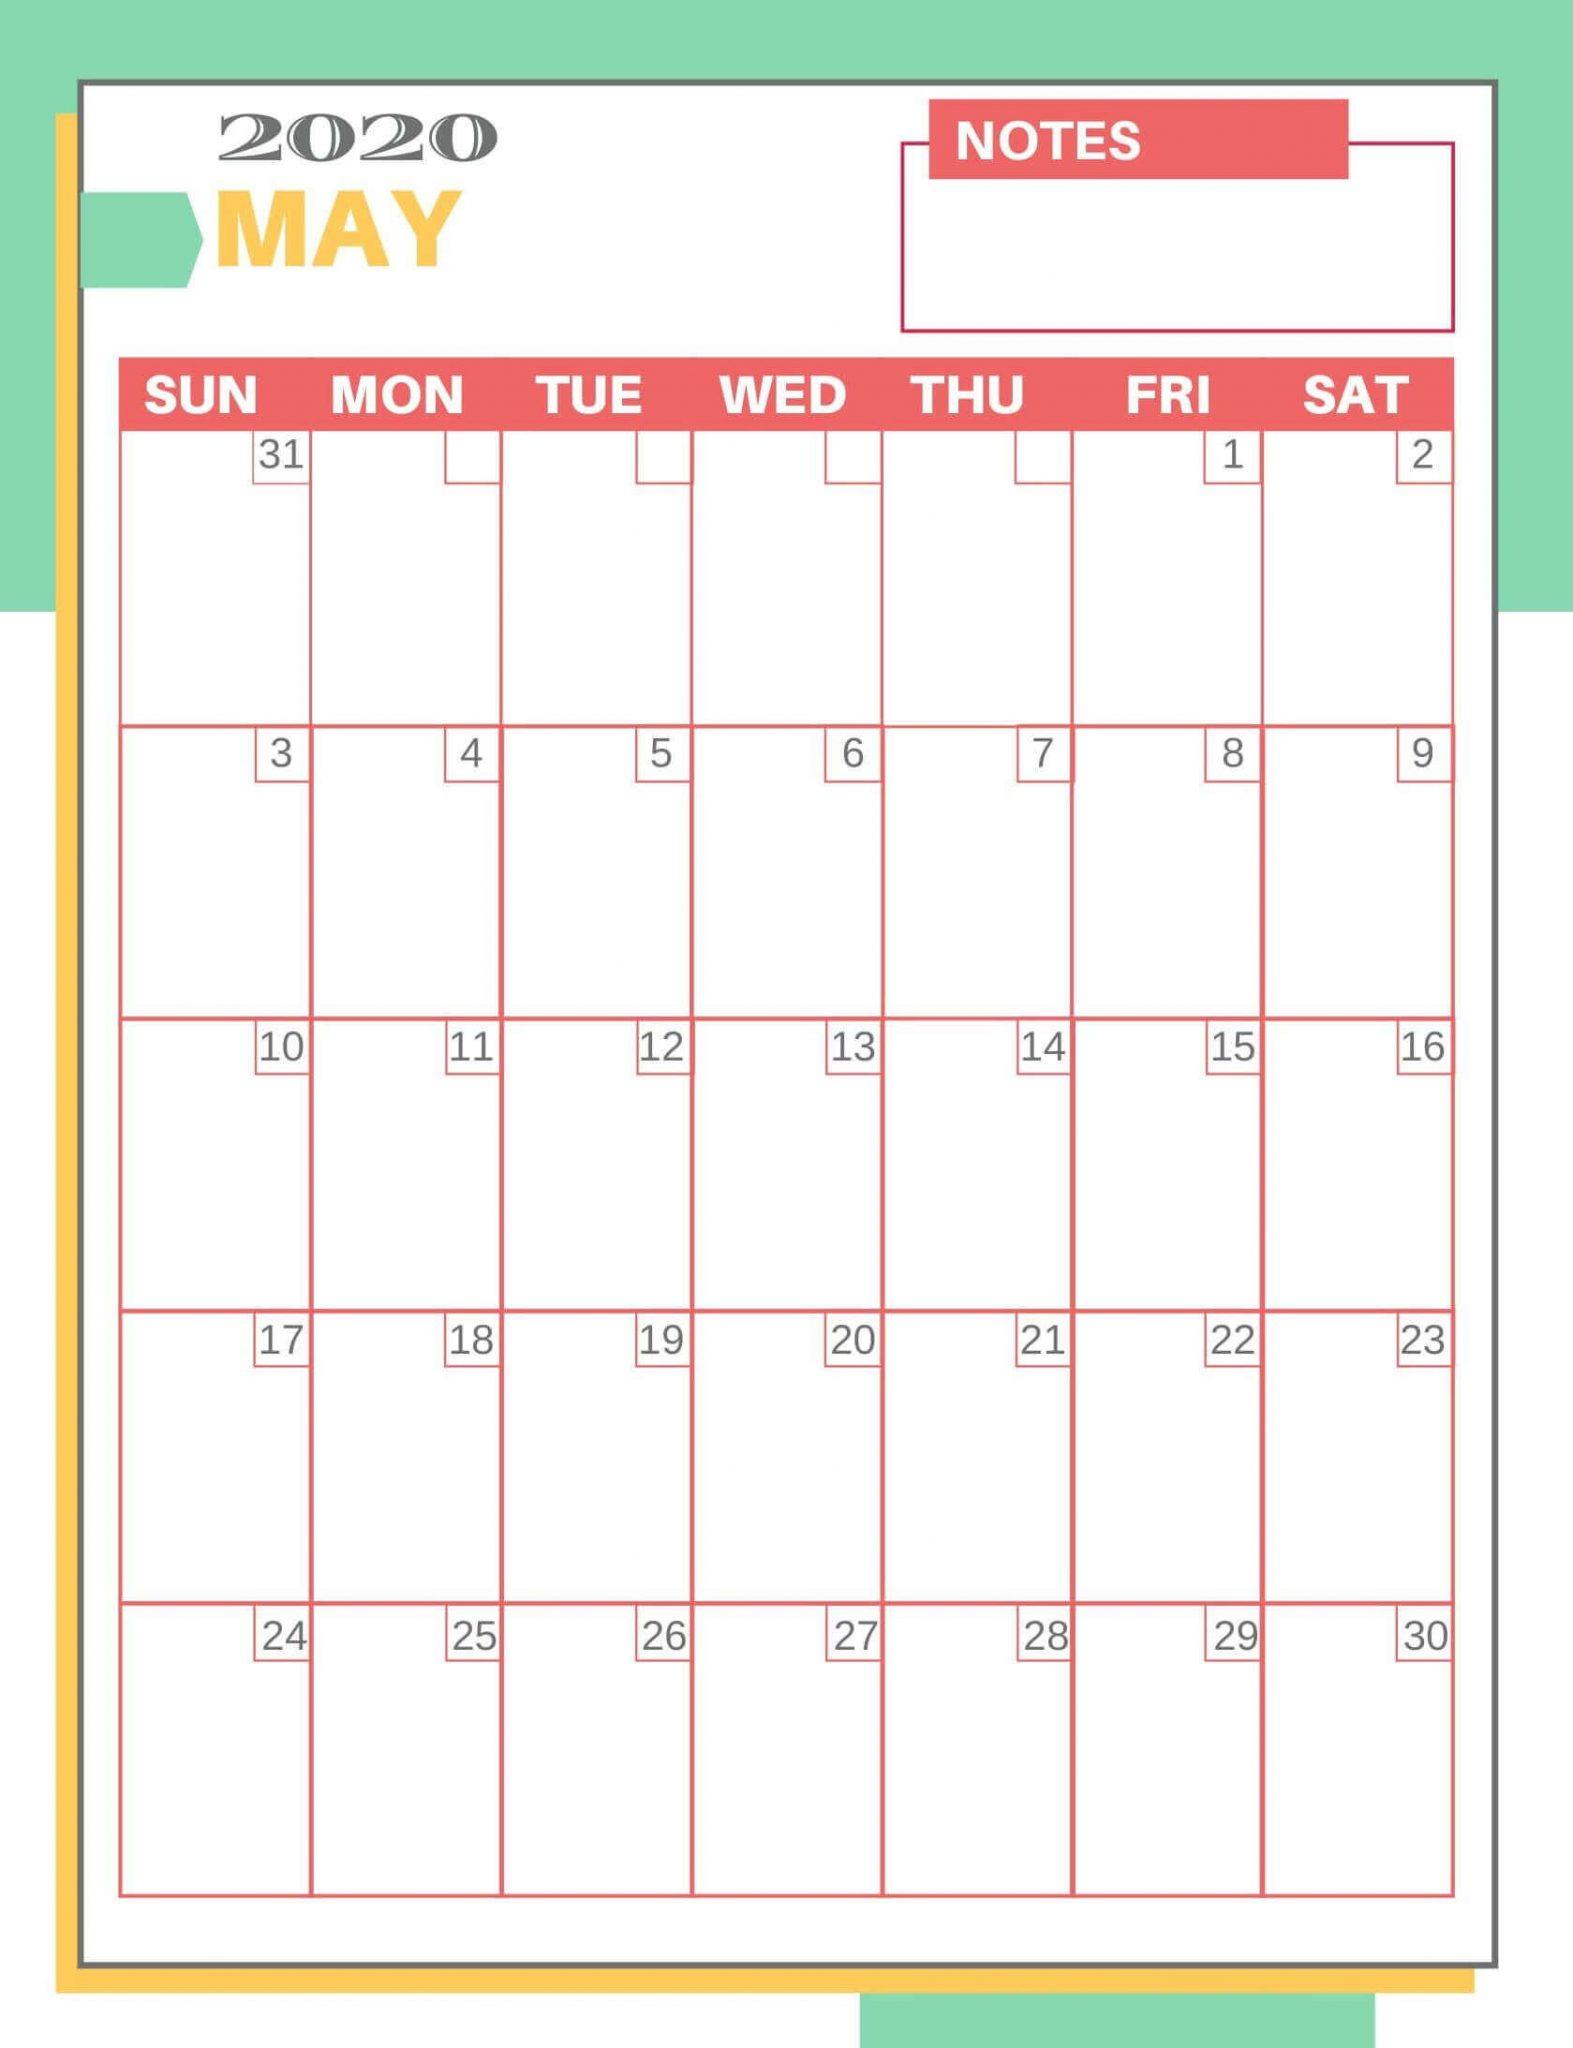 Free May 2020 Printable Calendar PDf